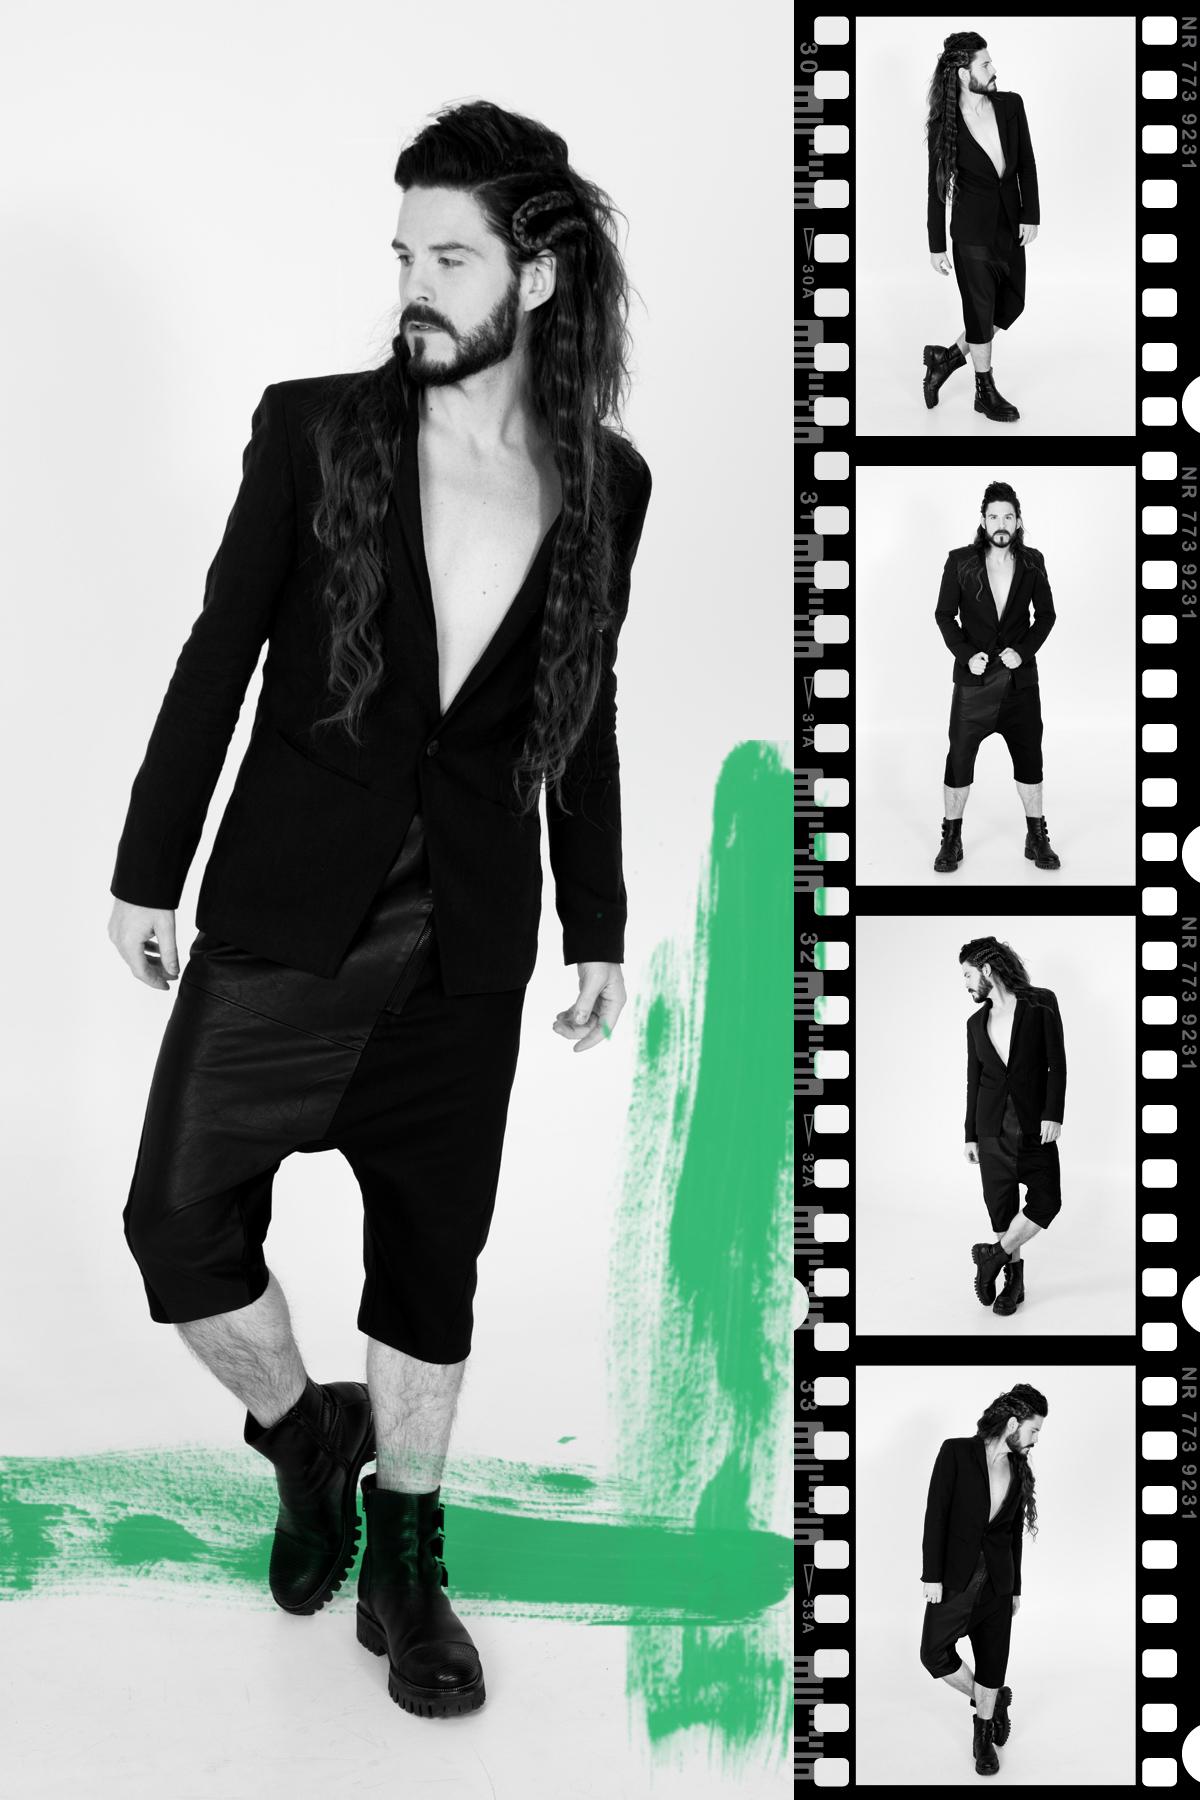 Editorial-Aleks-Kurkowski-Malefashion-Designer-Mode-High-Fashion-Avantgarde-Menswear-01